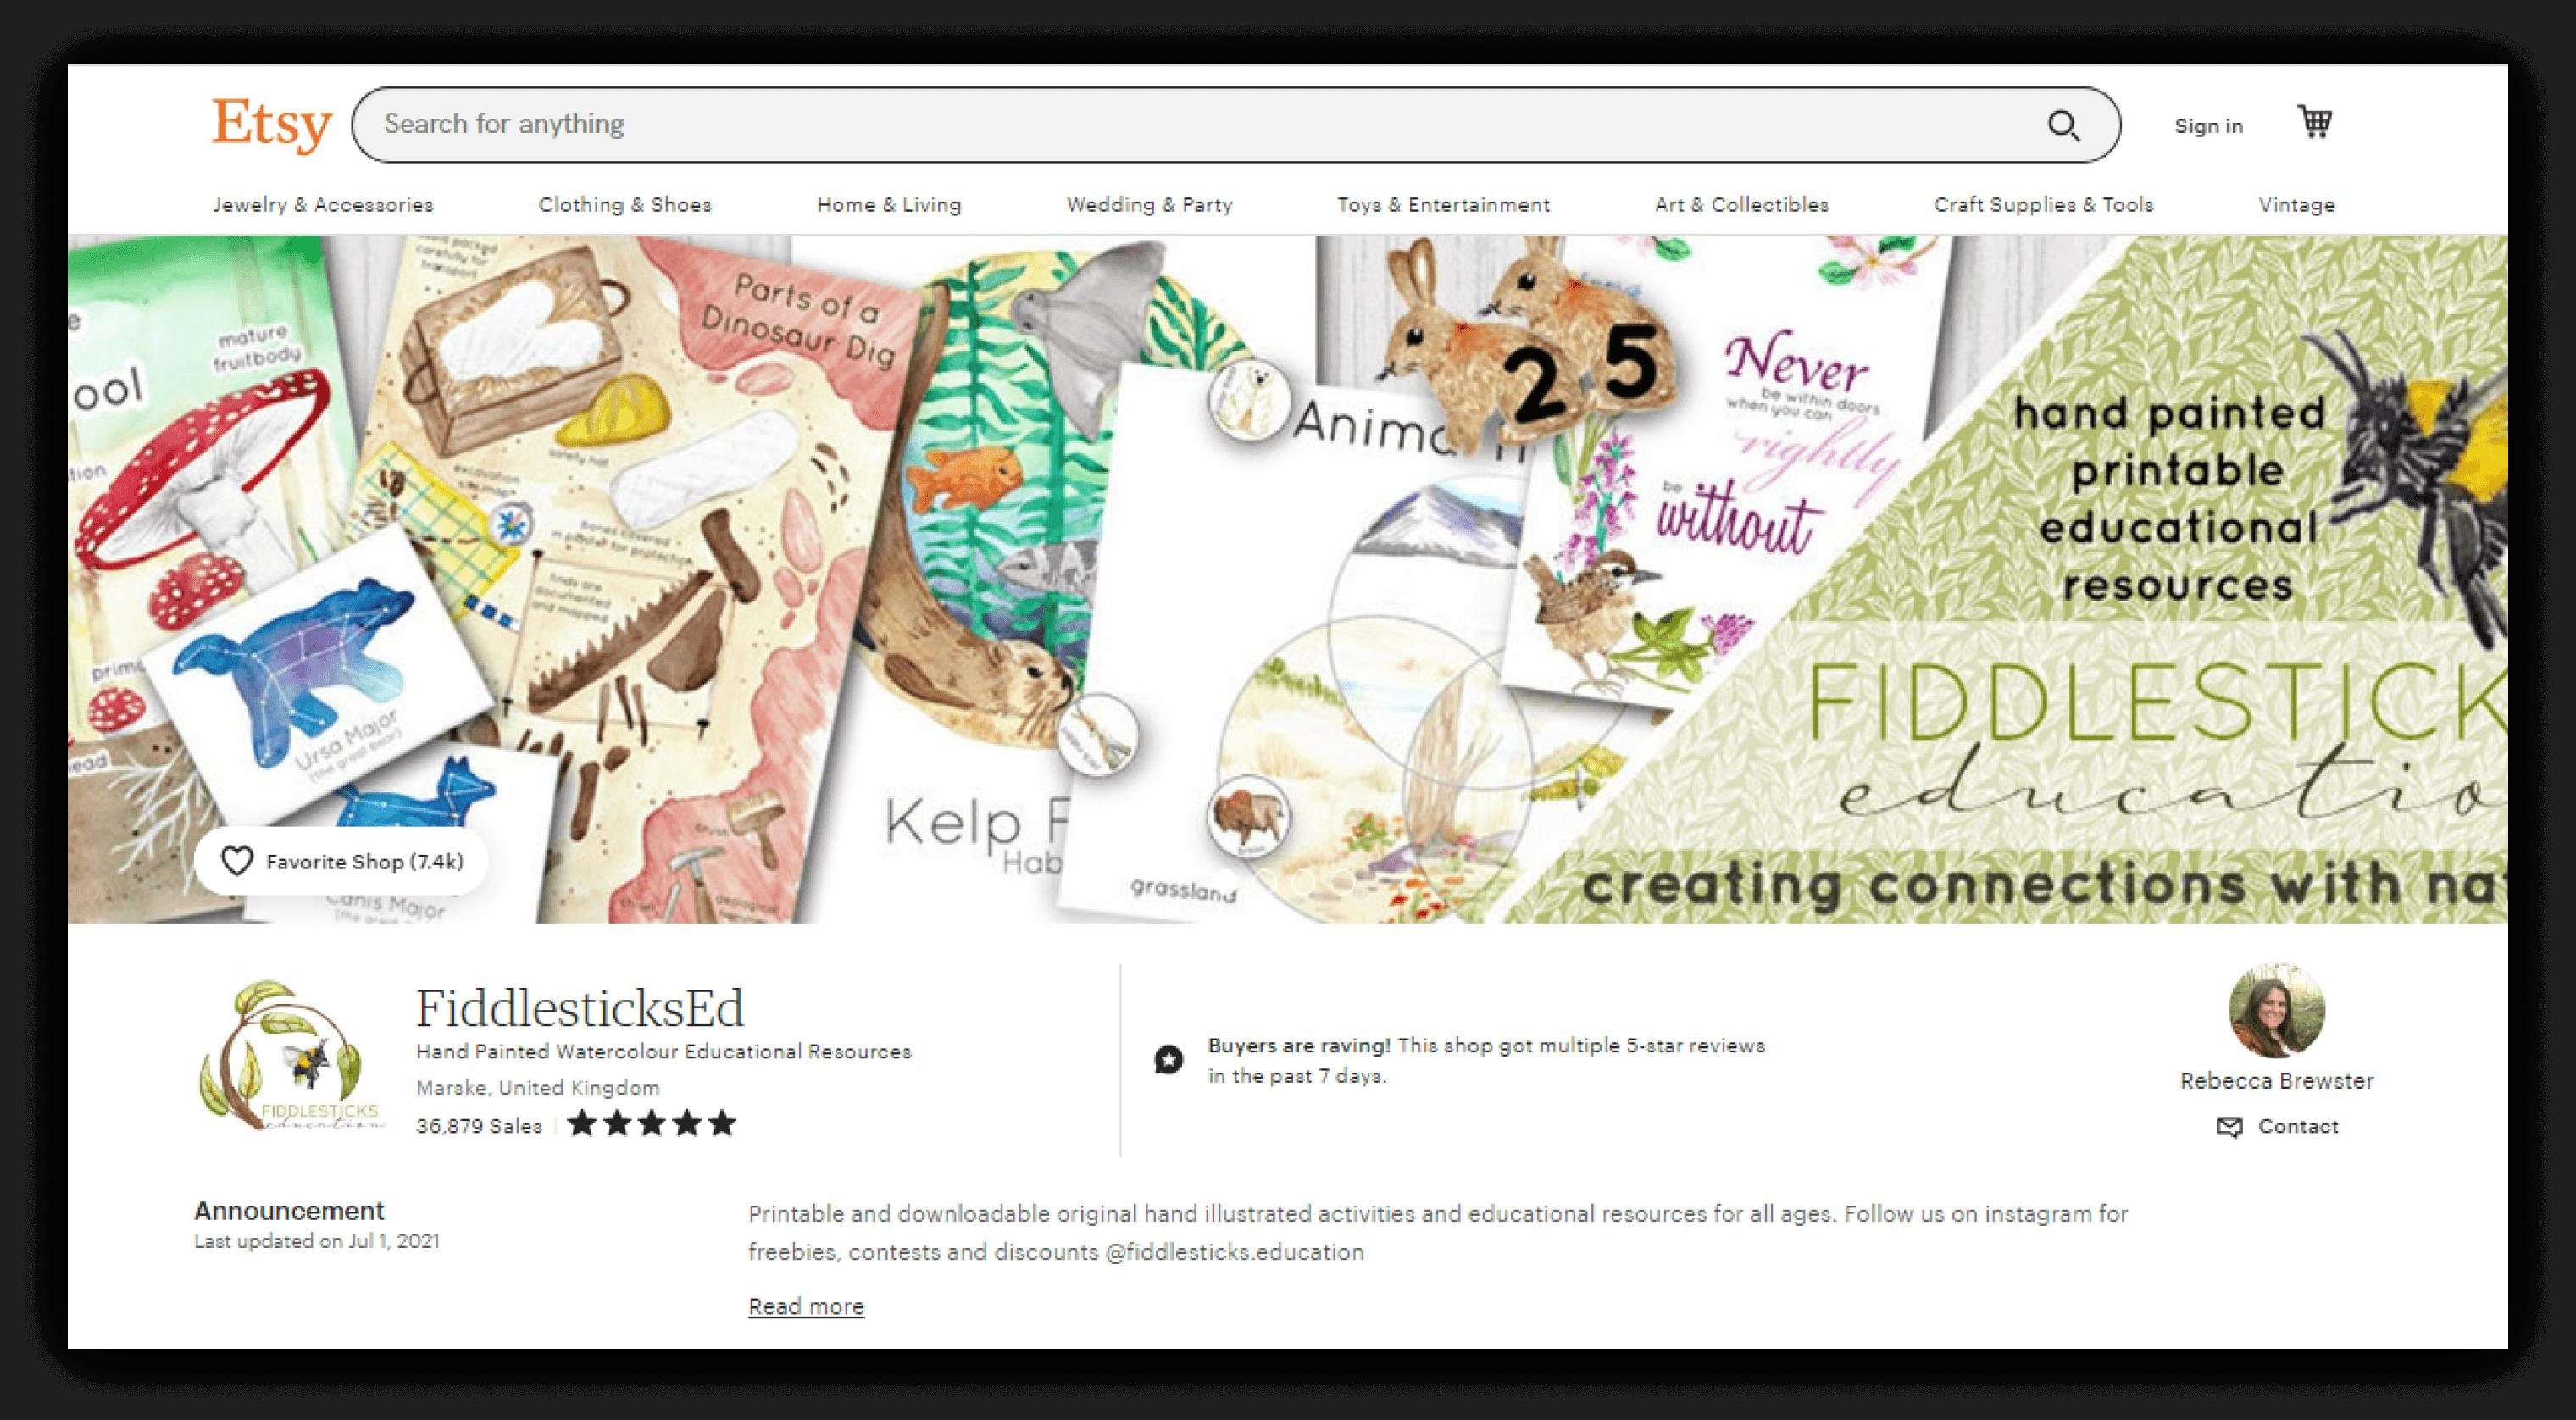 Fiddlesticks Education